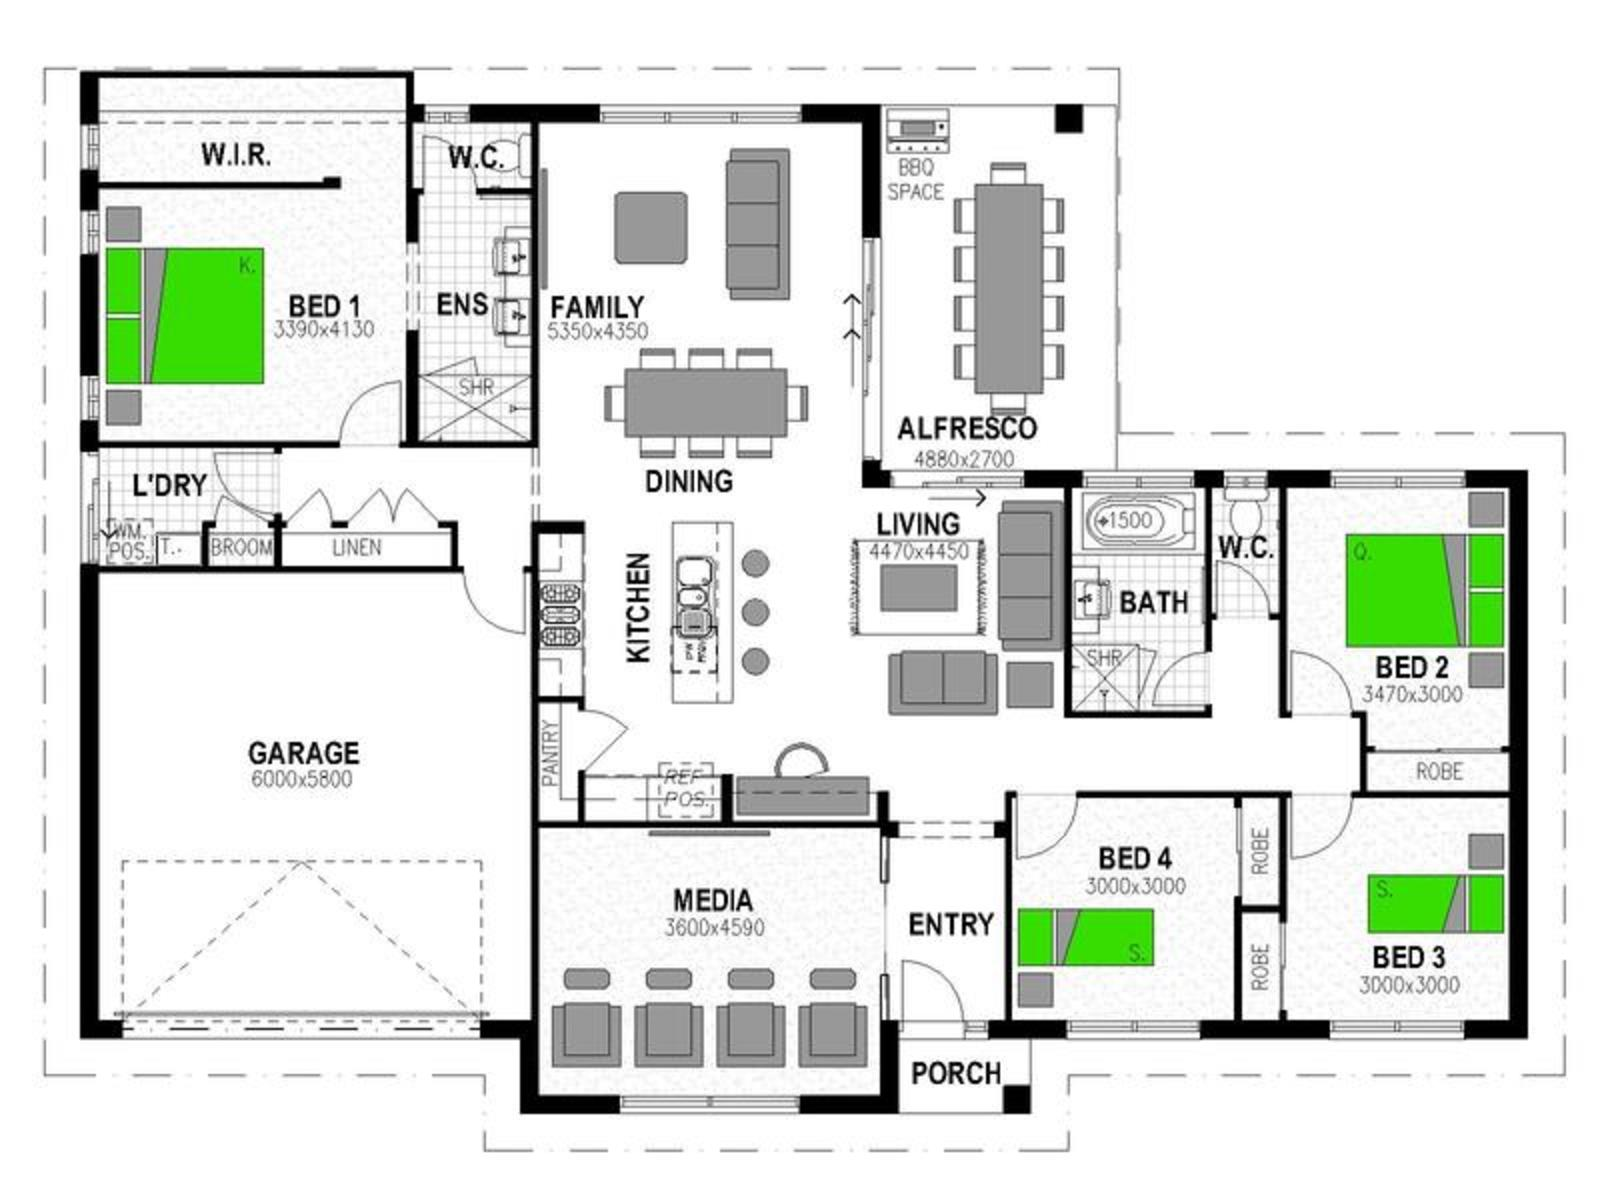 LOT 60 'FAIRWAYS ESTATE' HATTON VALE Floorplan